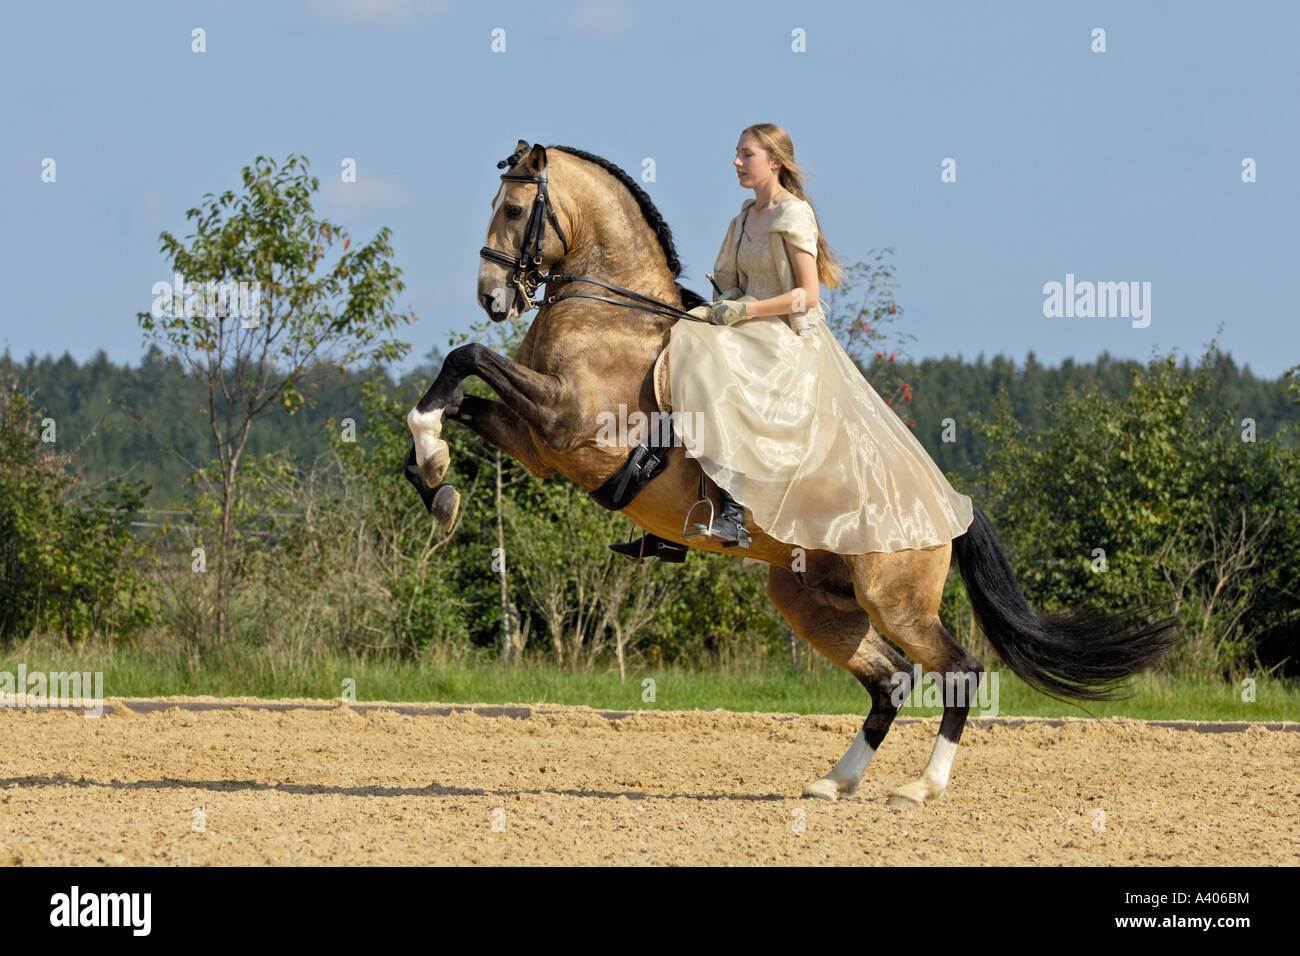 Girl wearing historic clothing on a rearing Lusitano horse stallion circus exercise - Stock Image